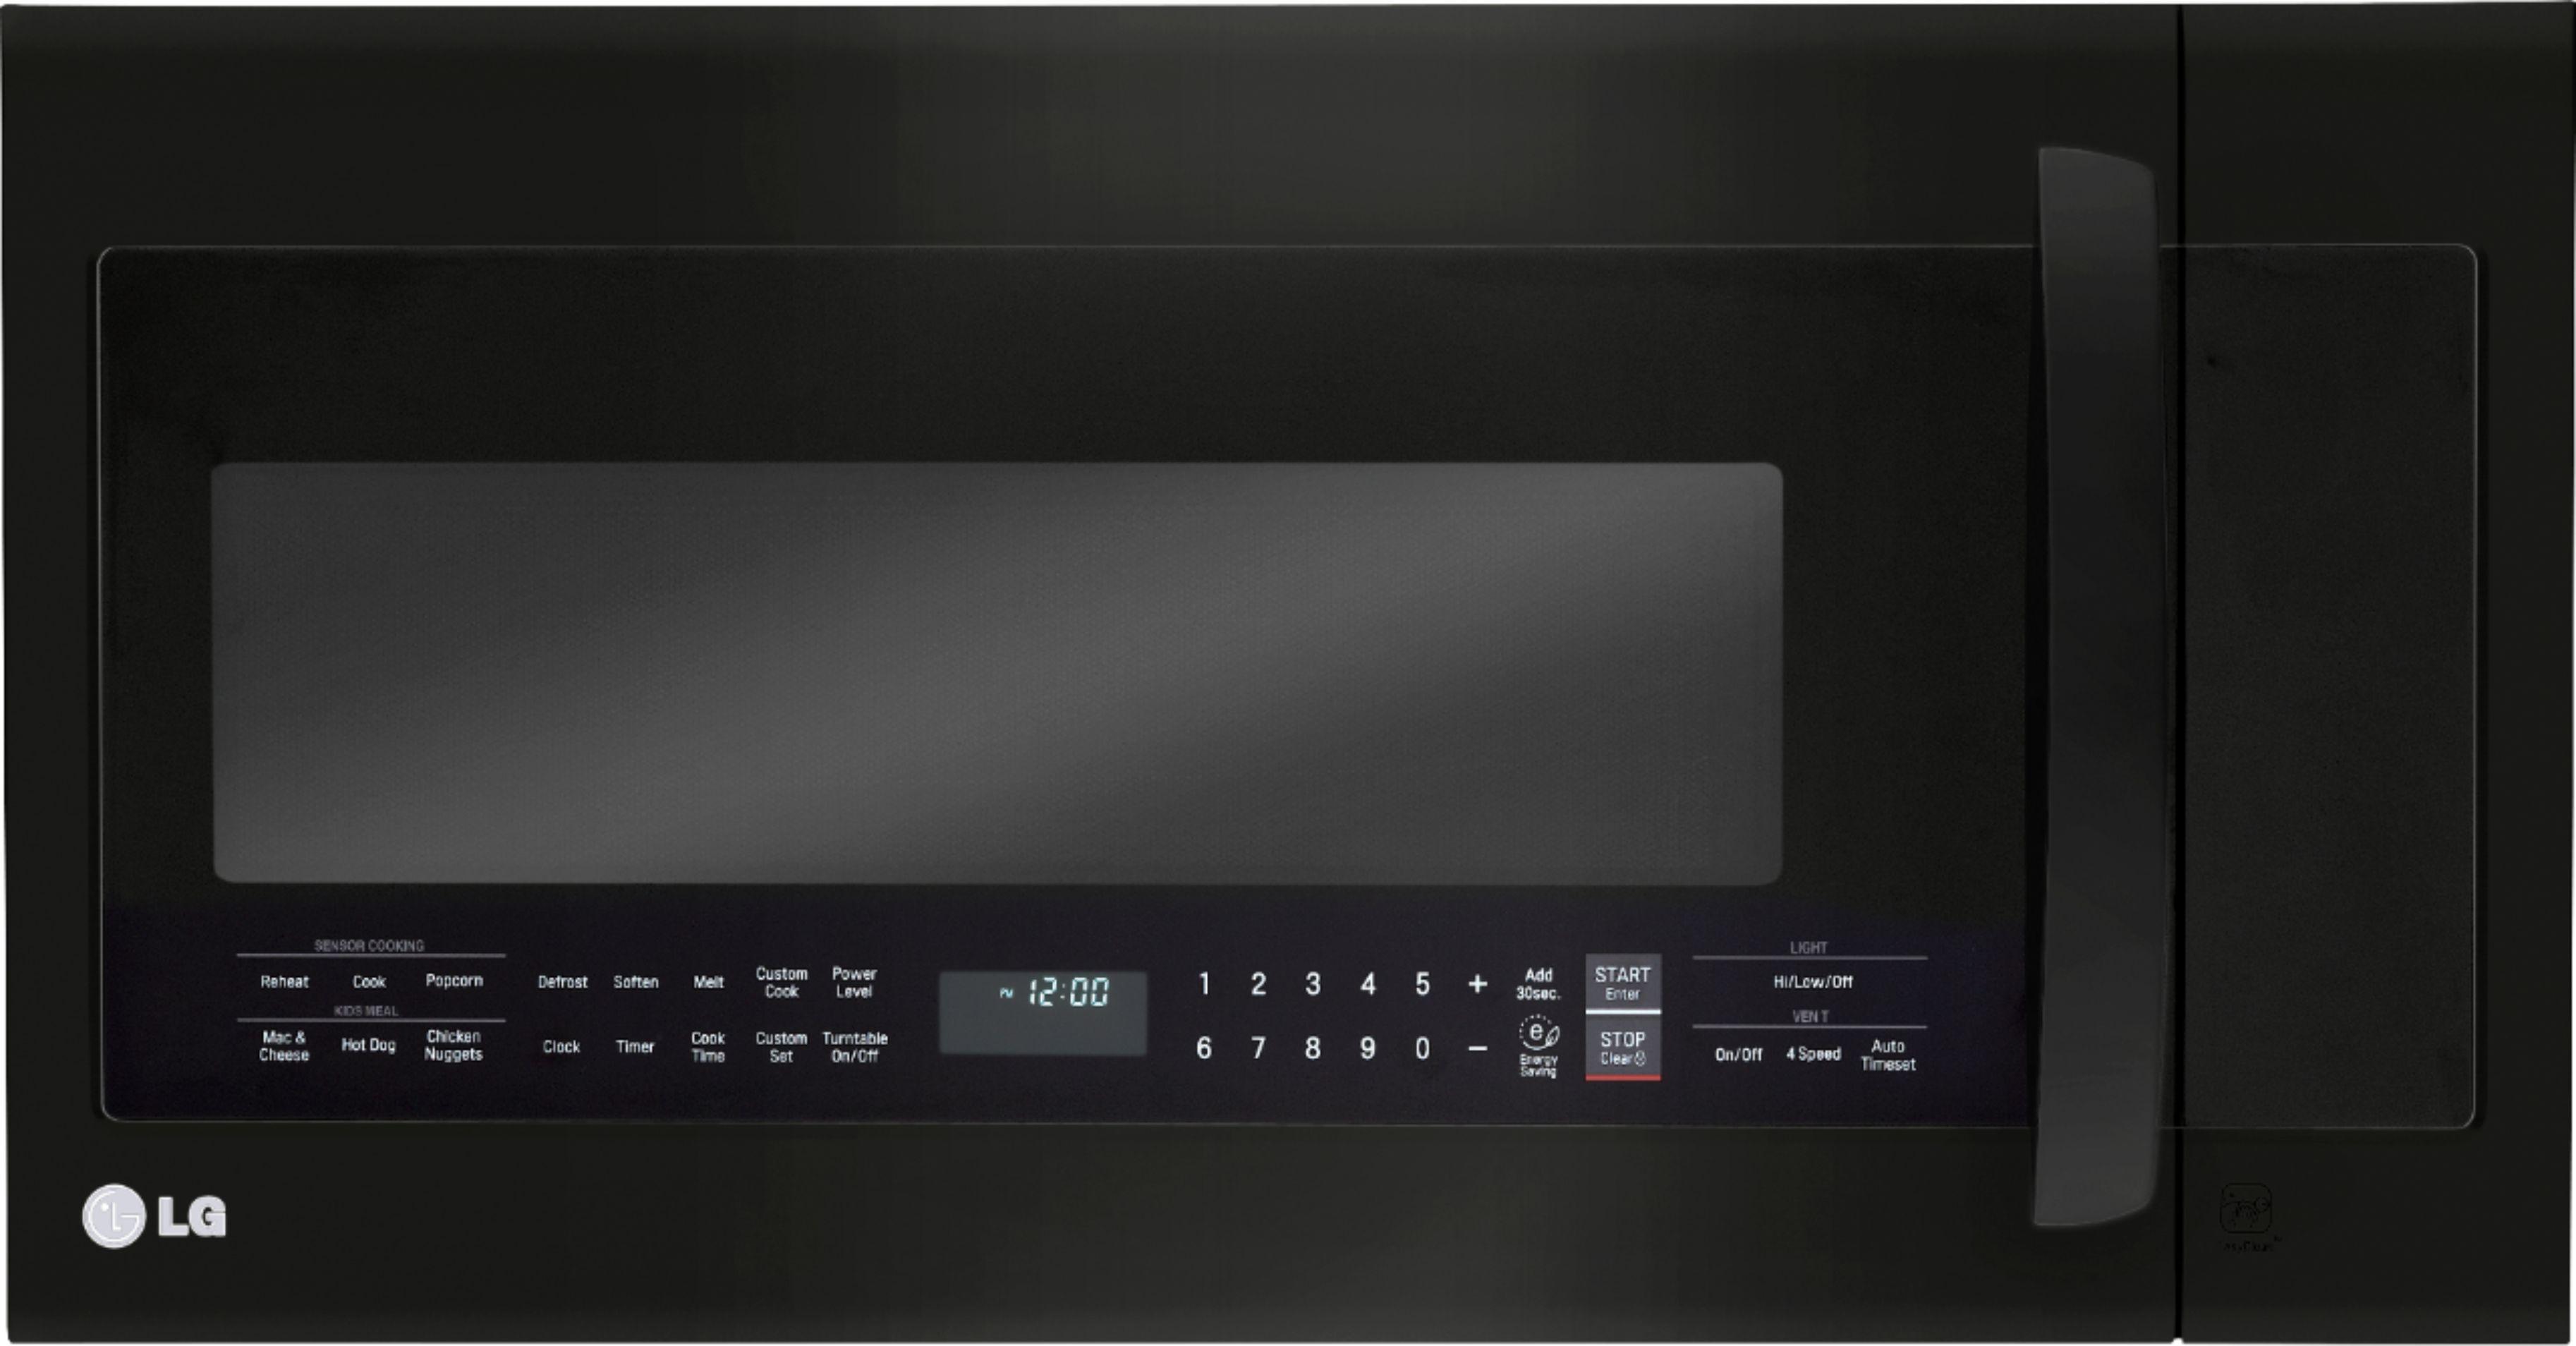 lg 2 0 cu ft over the range microwave with sensor cooking printproof matte black stainless steel